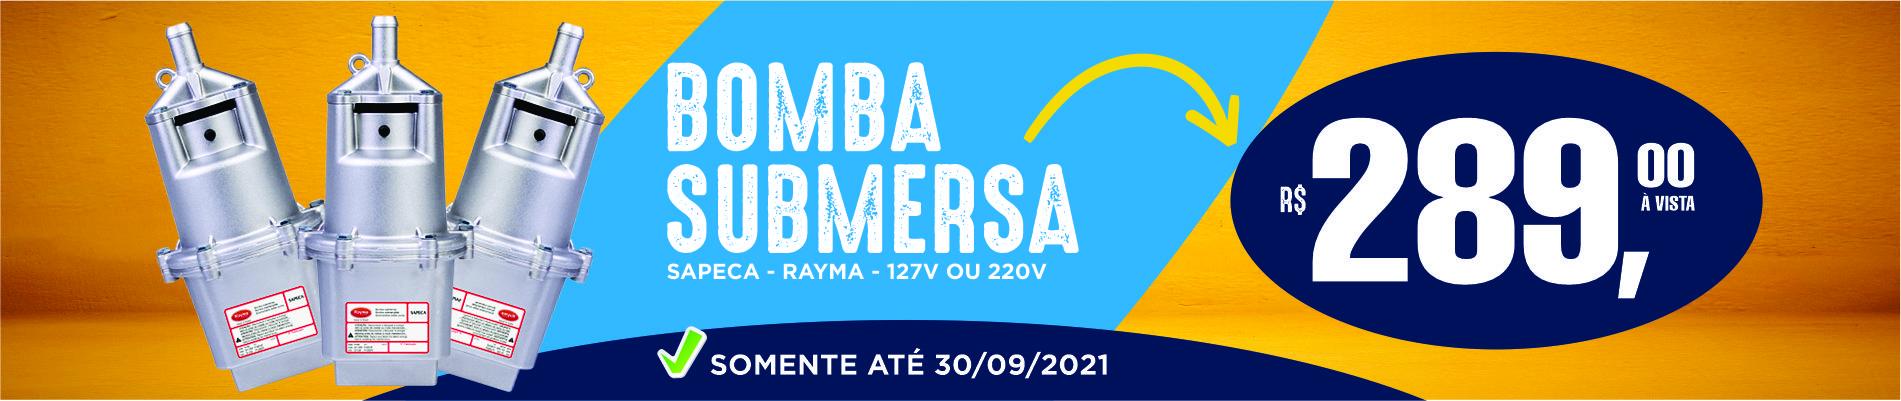 Banner Bomba Submersa